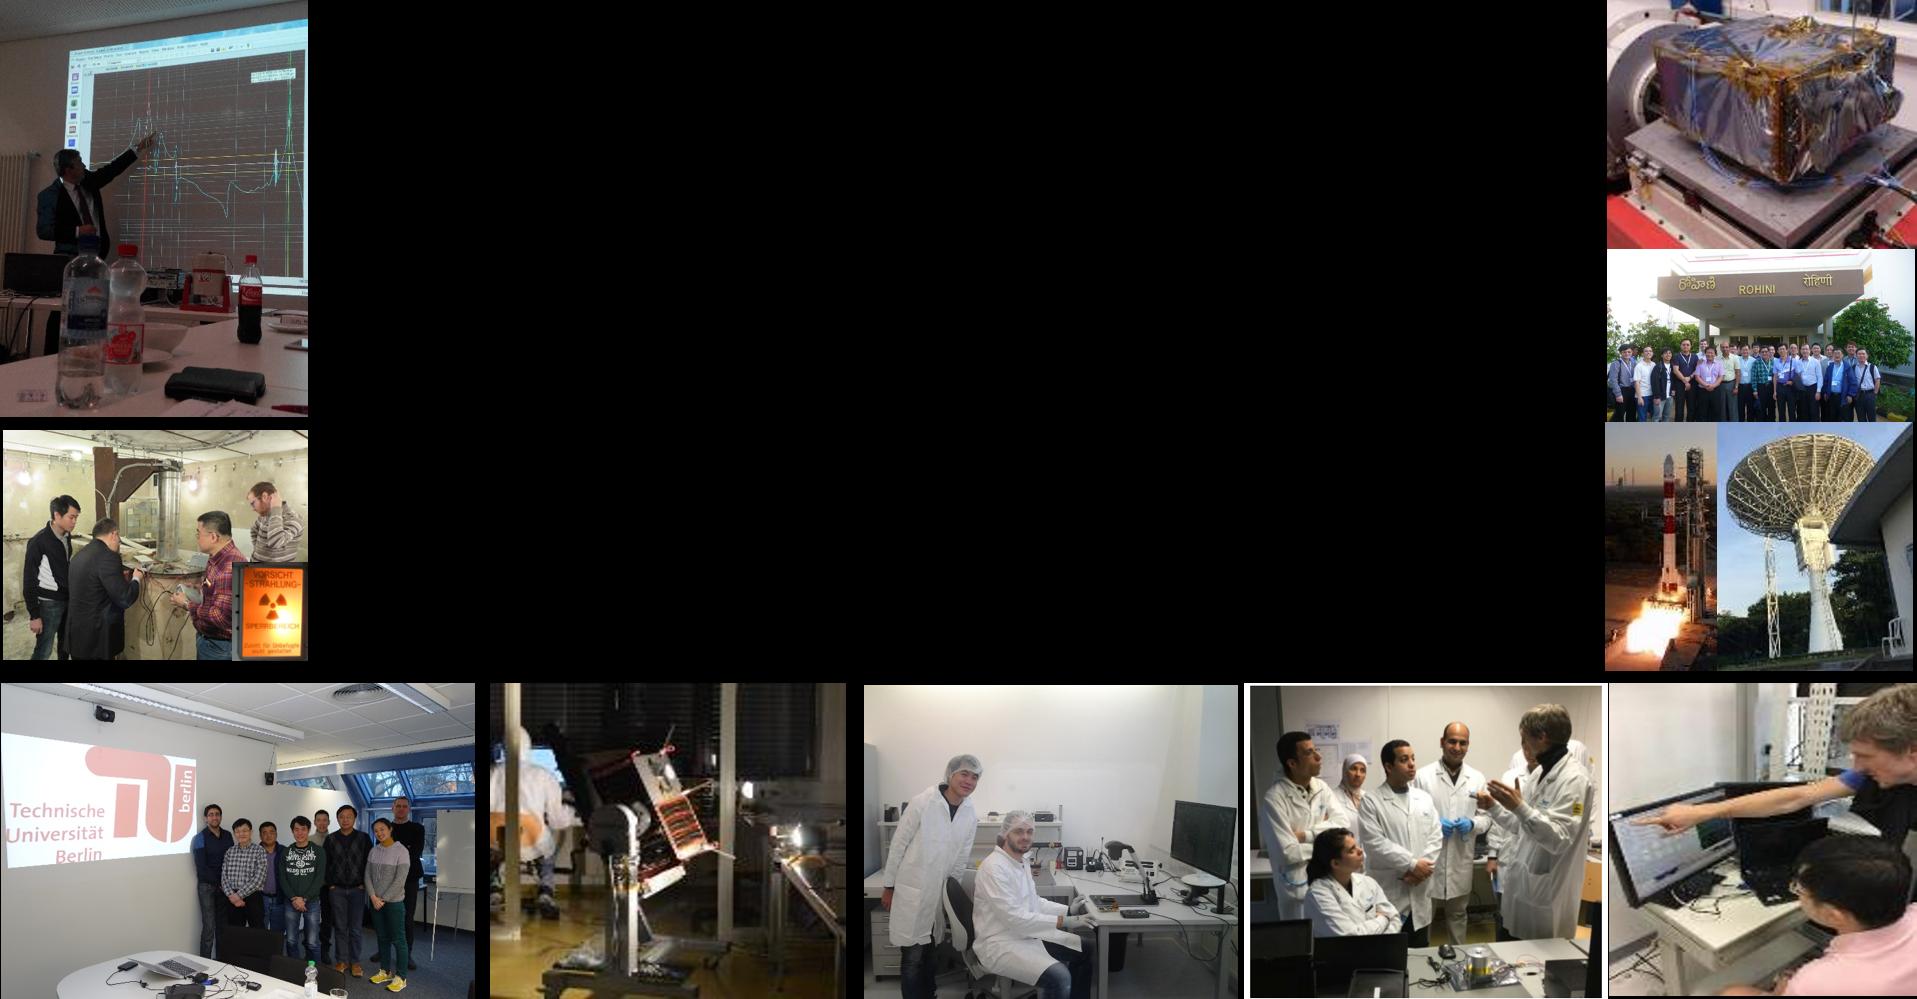 Iac Gmbh berlin space technologies iac 2016